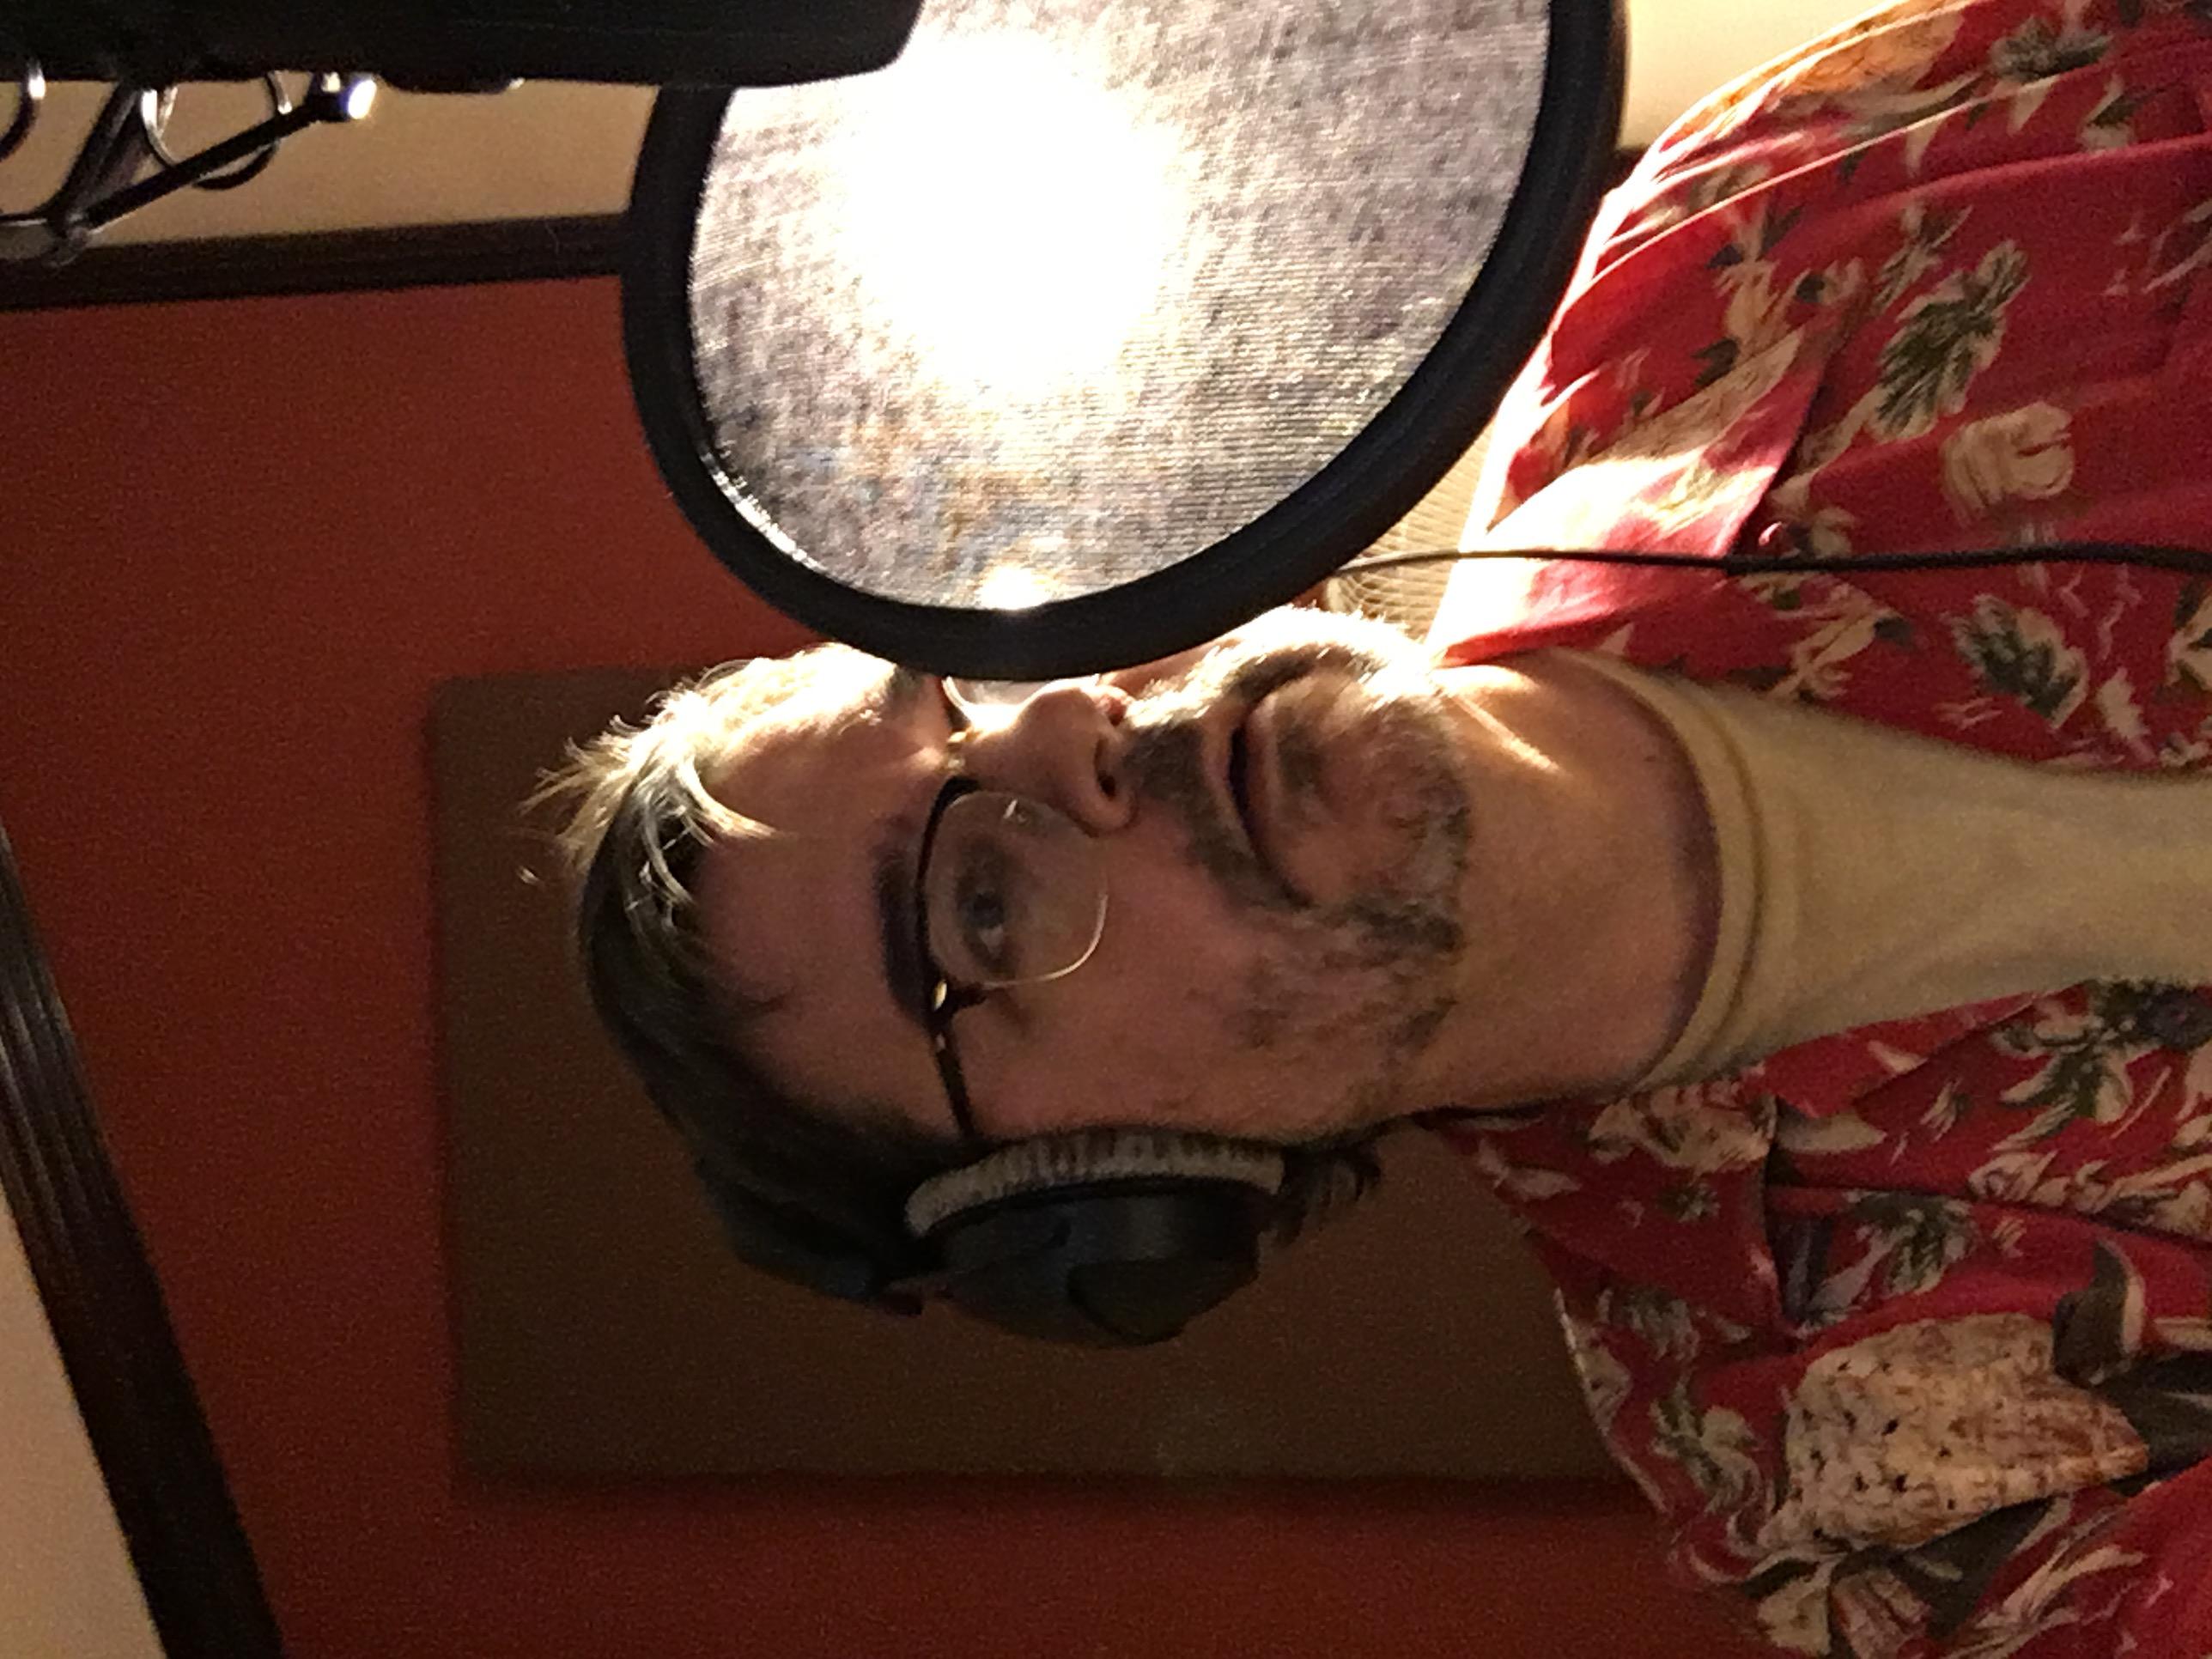 Phoef recording